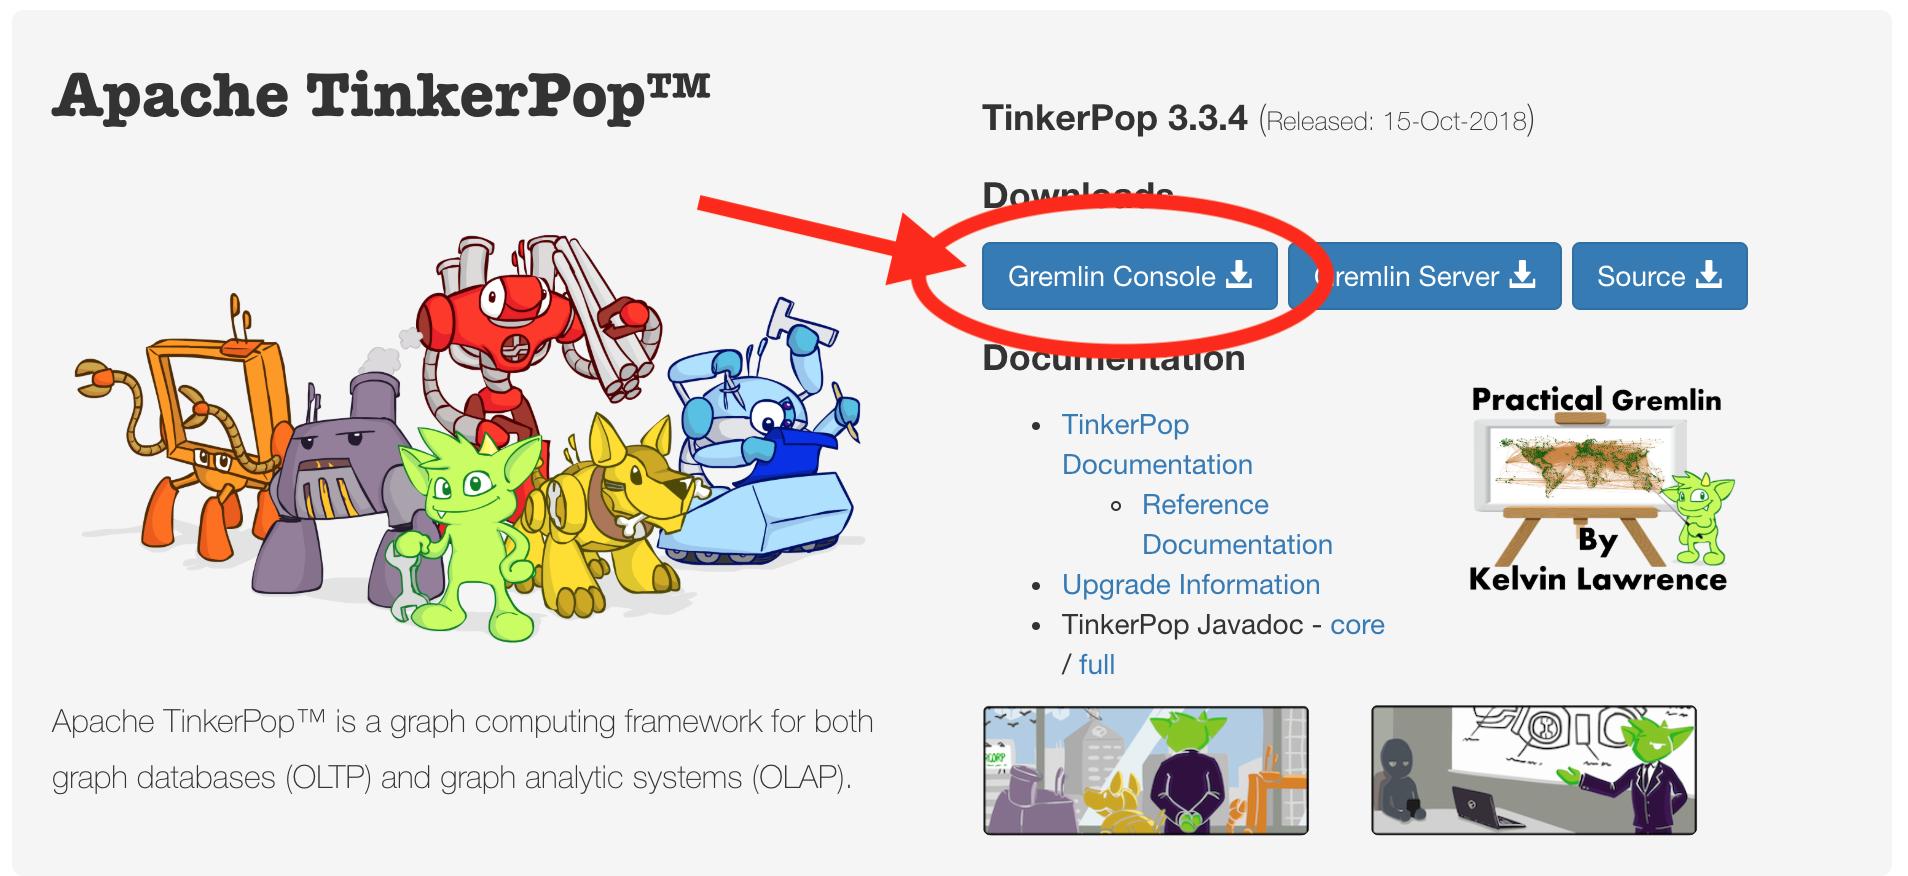 Apache TinkerPop Gremlin Console